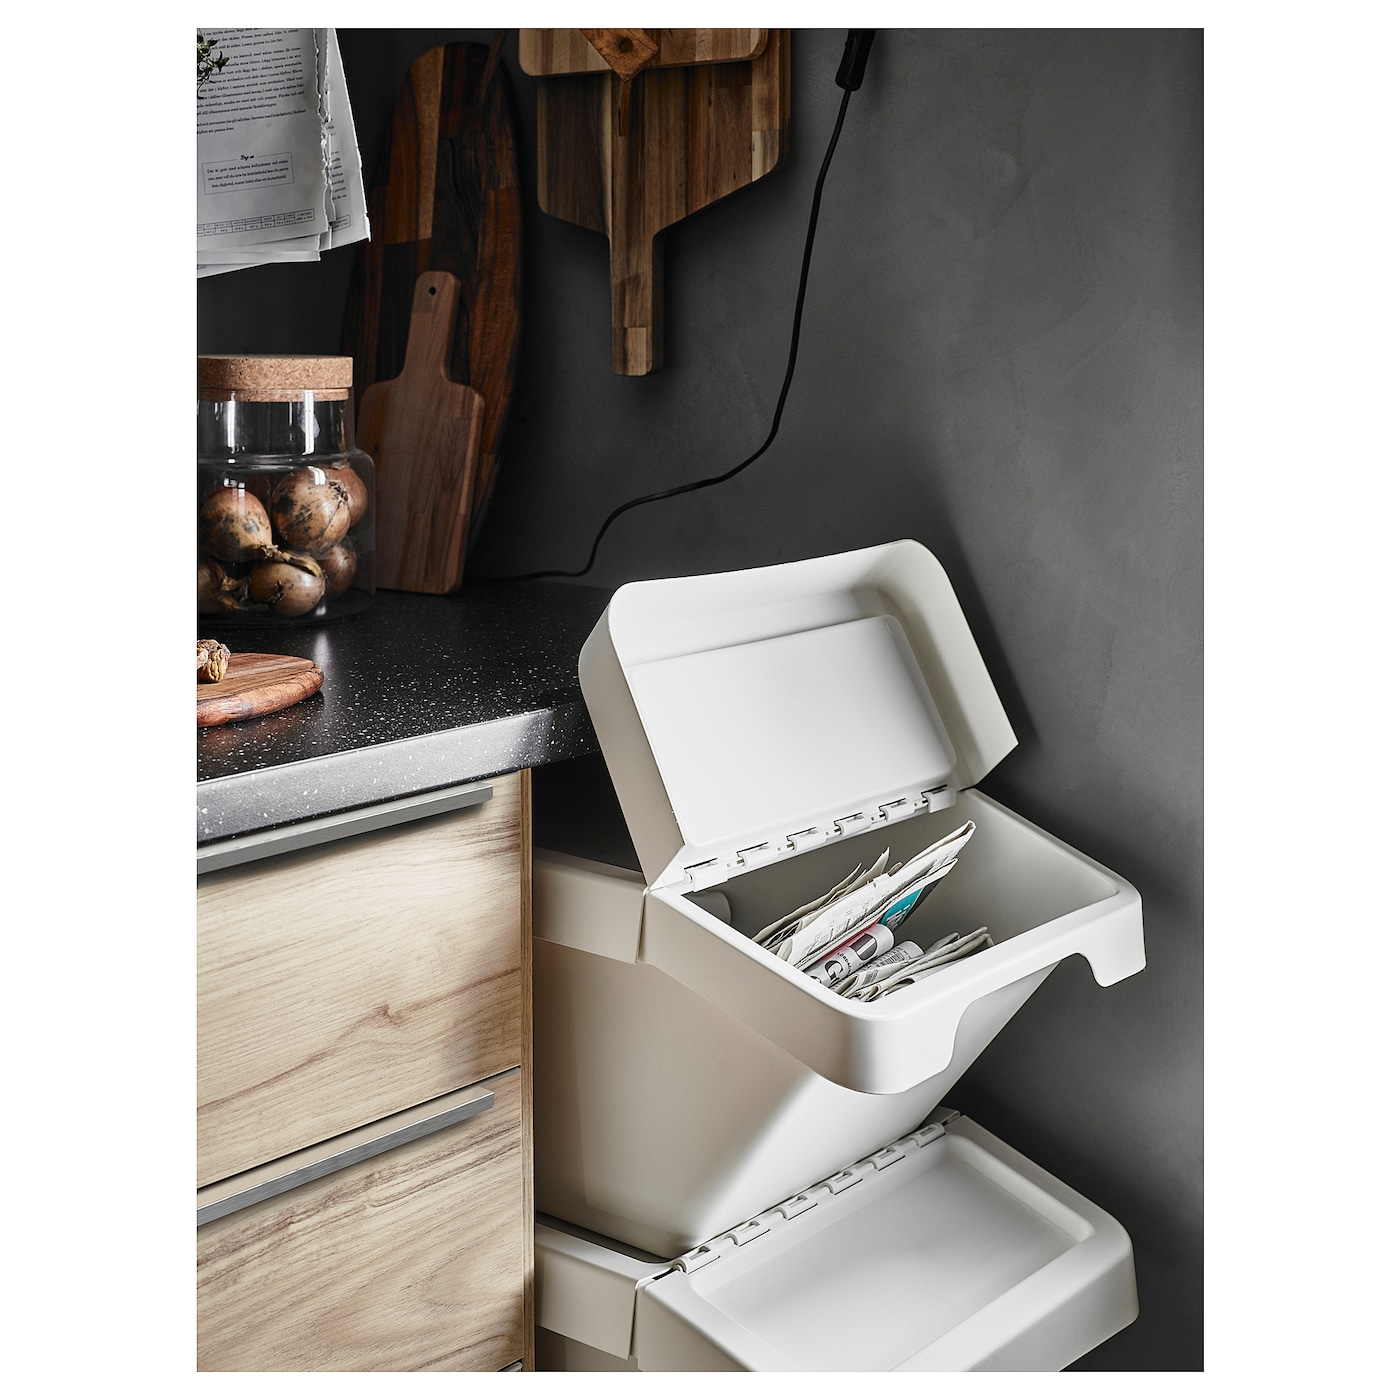 SORTERA Waste sorting bin with lid - white 11 gallon (11 l)